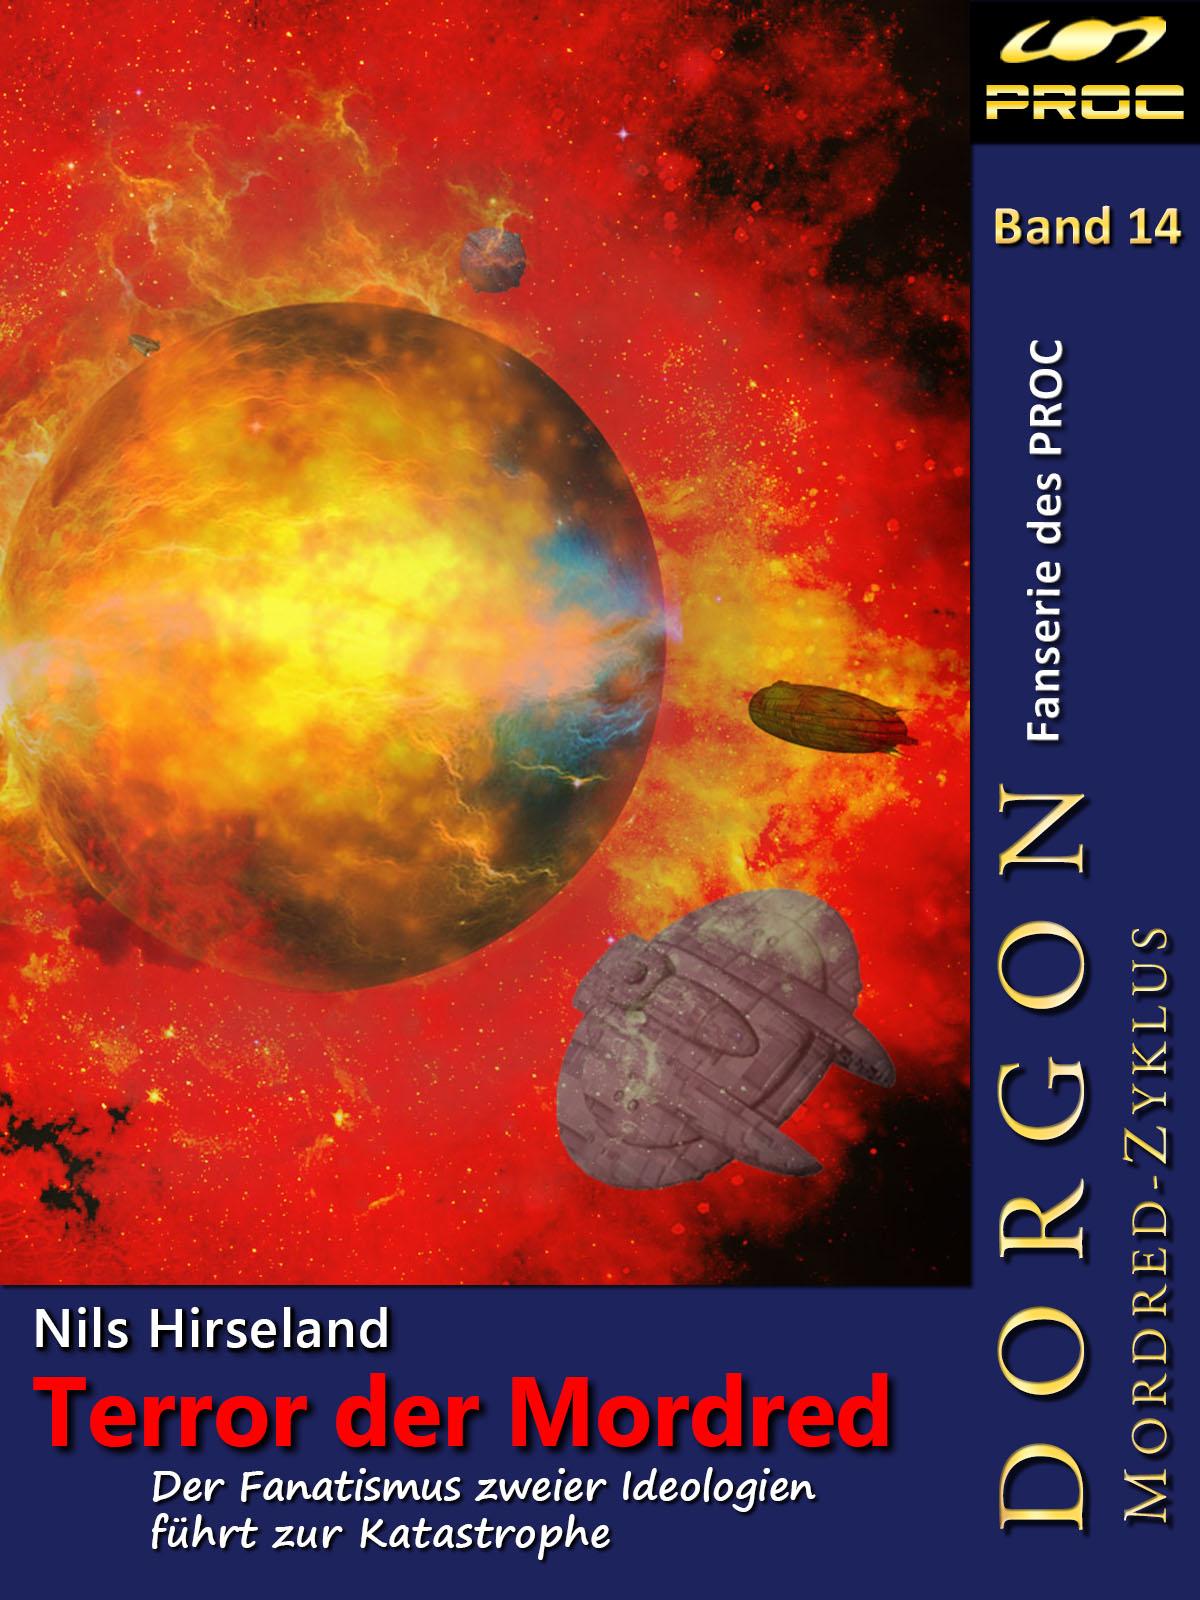 DORGON Cover Band 14